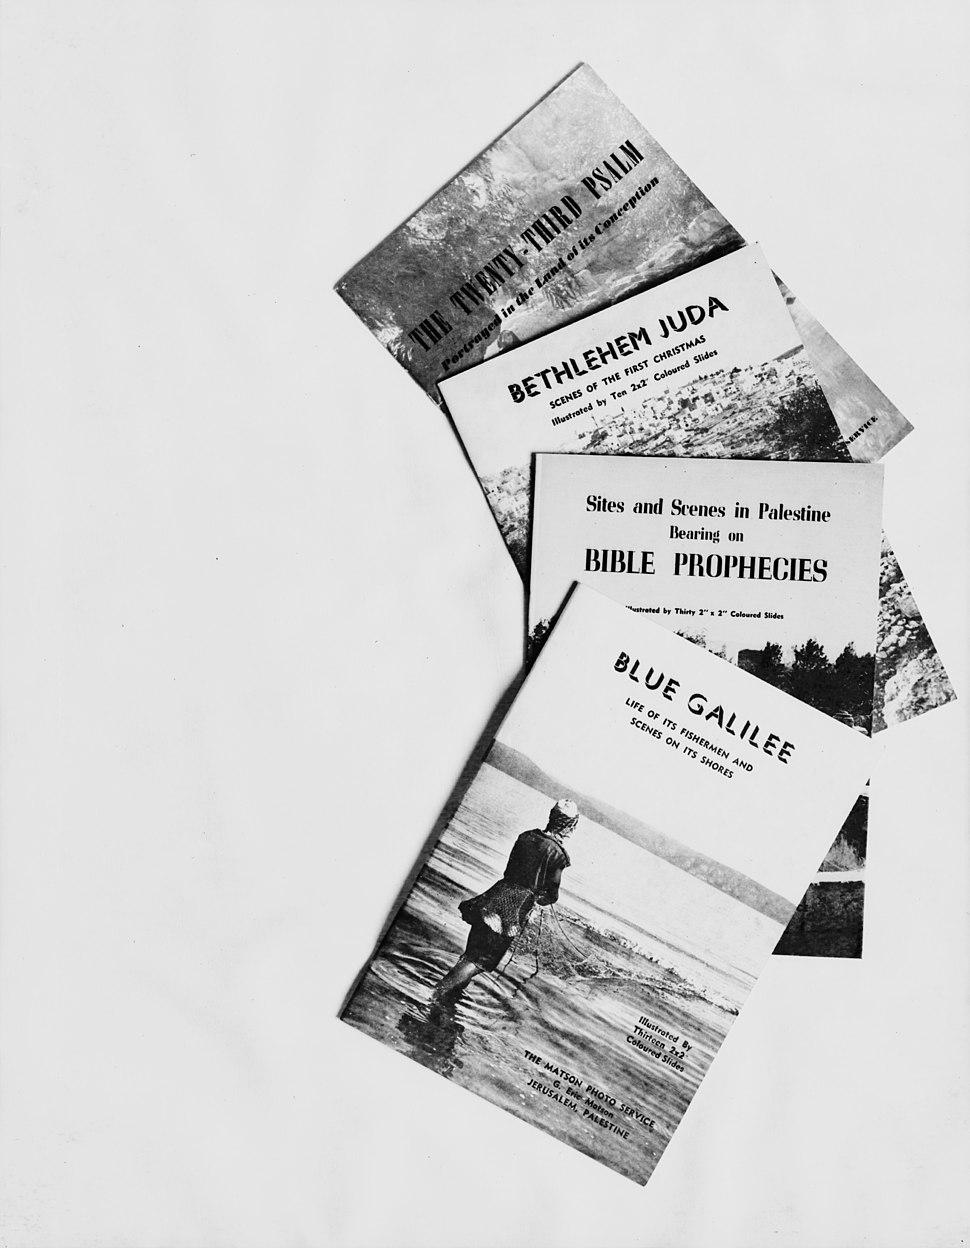 Advertising film for cut made for audio visual resource guide, Dec. 20, 1955 LOC matpc.12997